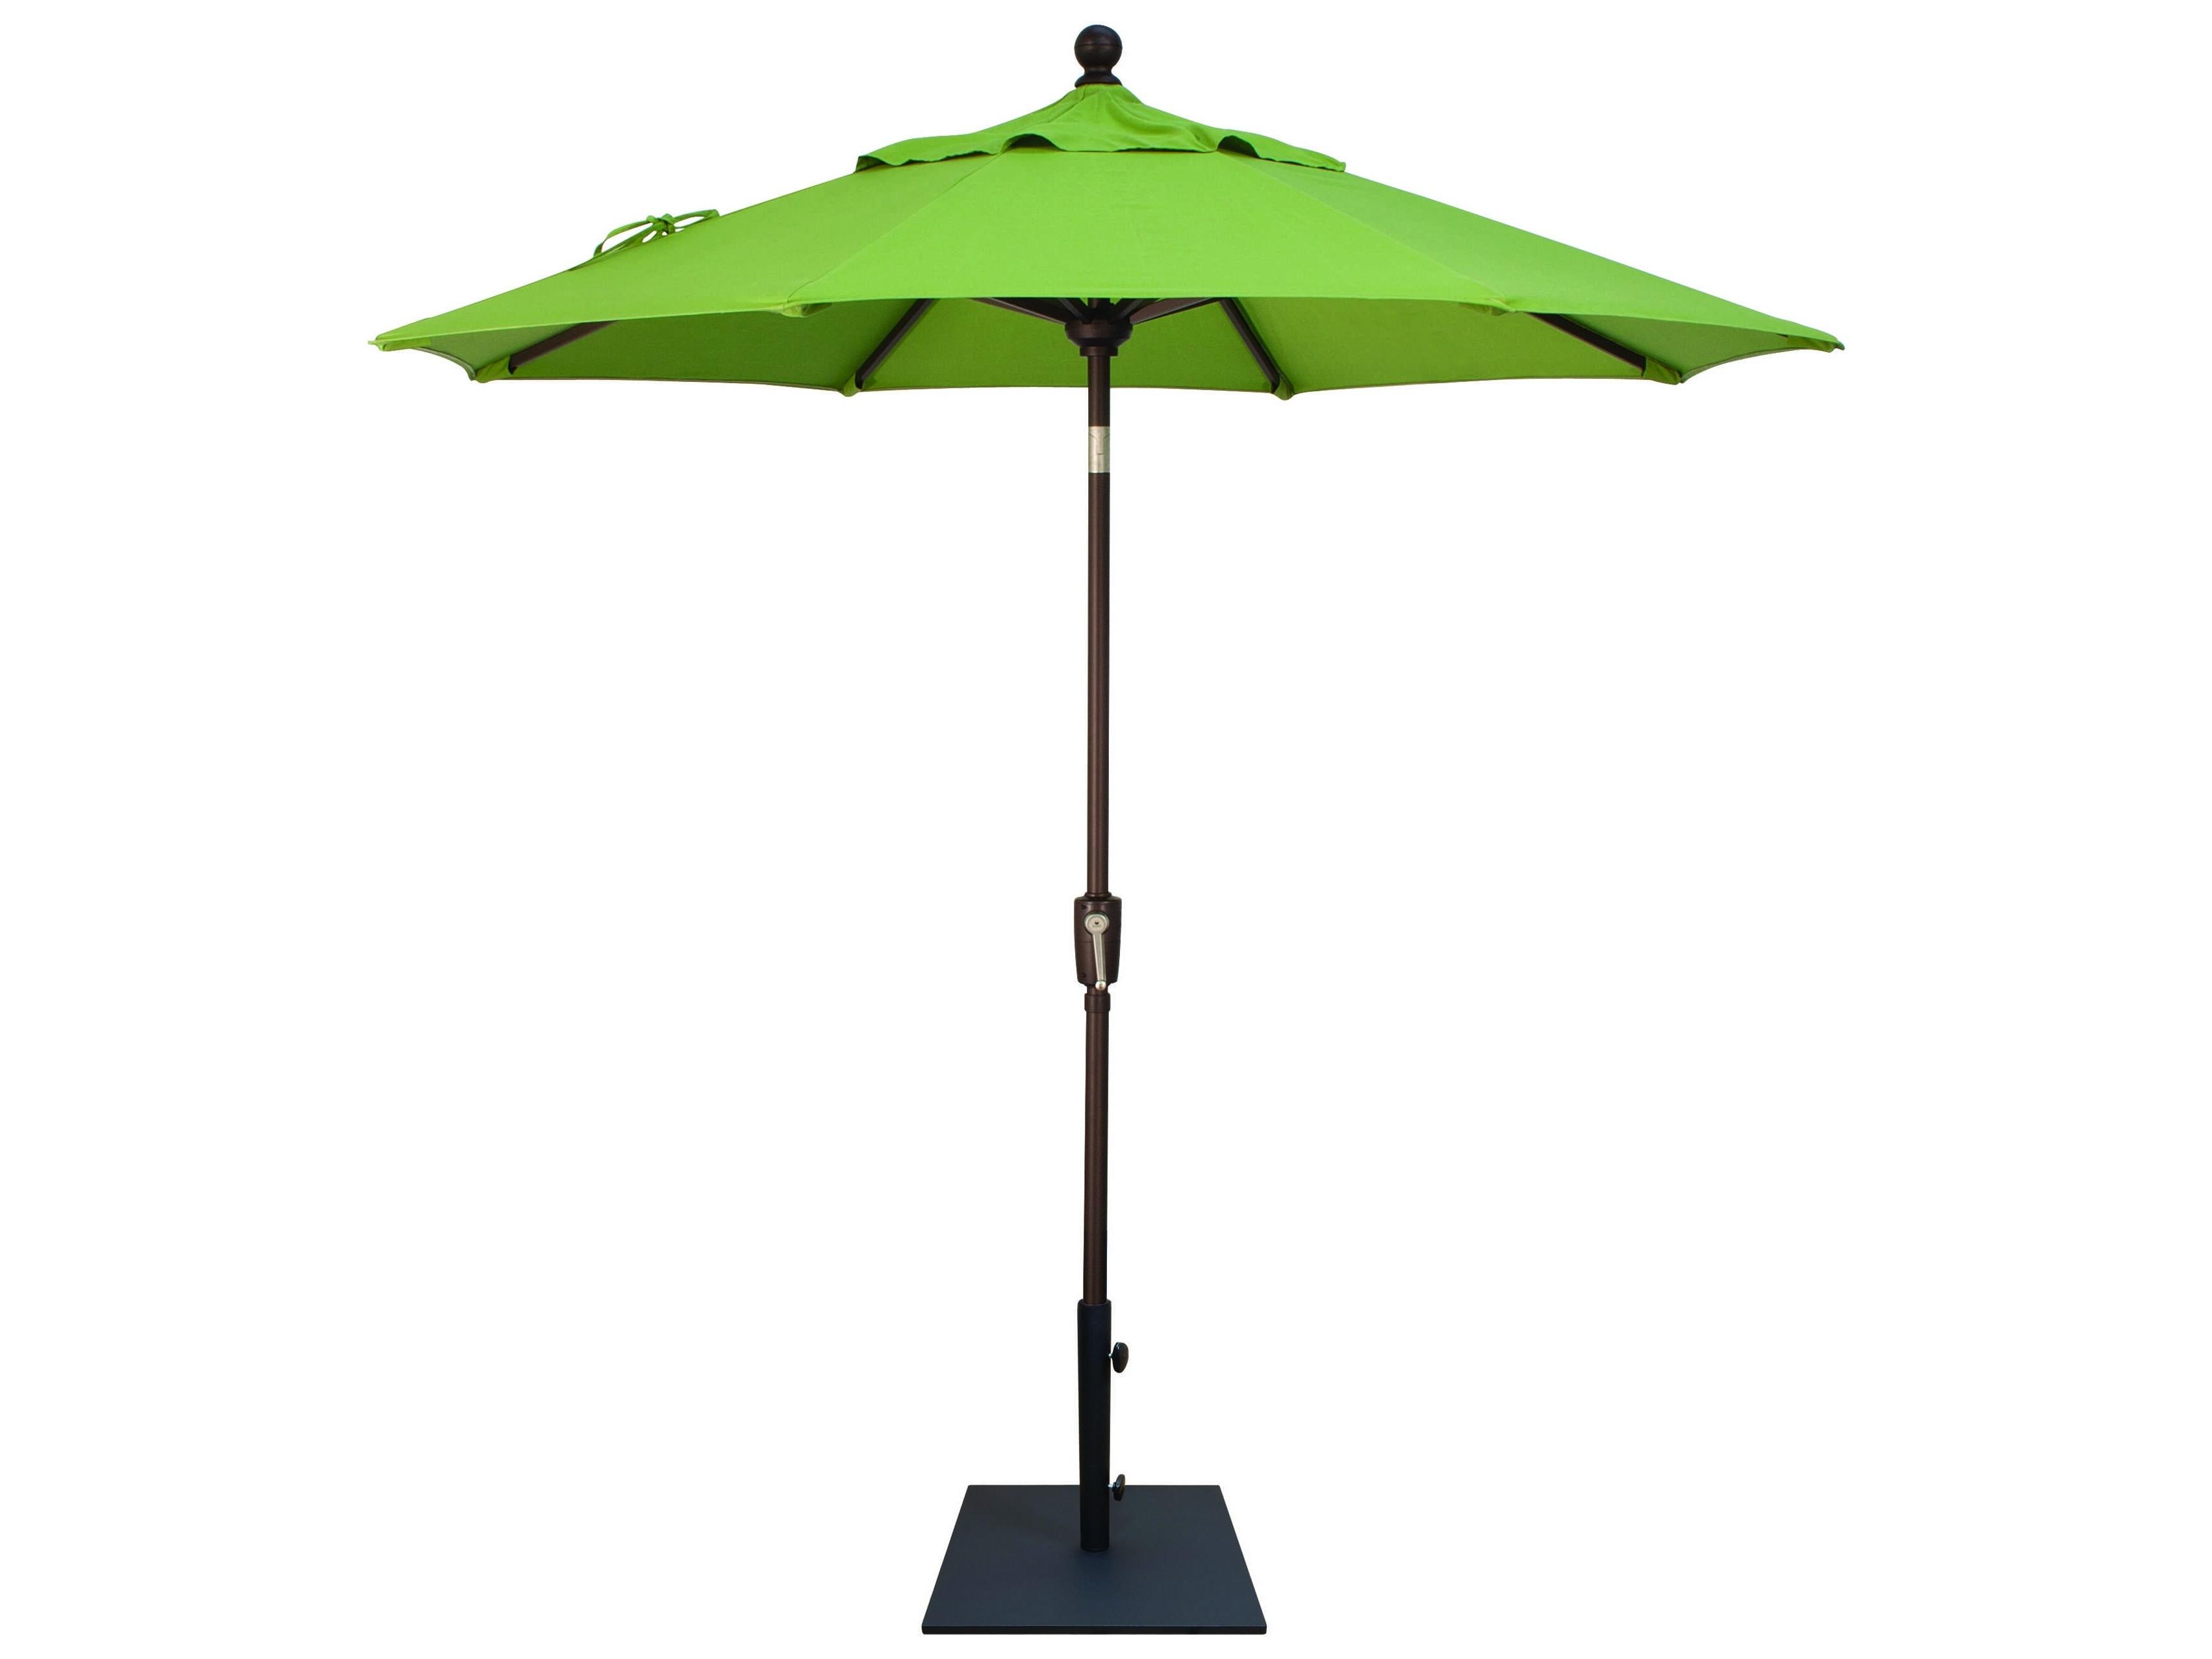 Garden Treasures Patio Umbrella Reviews Unique Amazon Tourke 9Ft Led In Current Lighted Patio Umbrellas (Gallery 15 of 20)